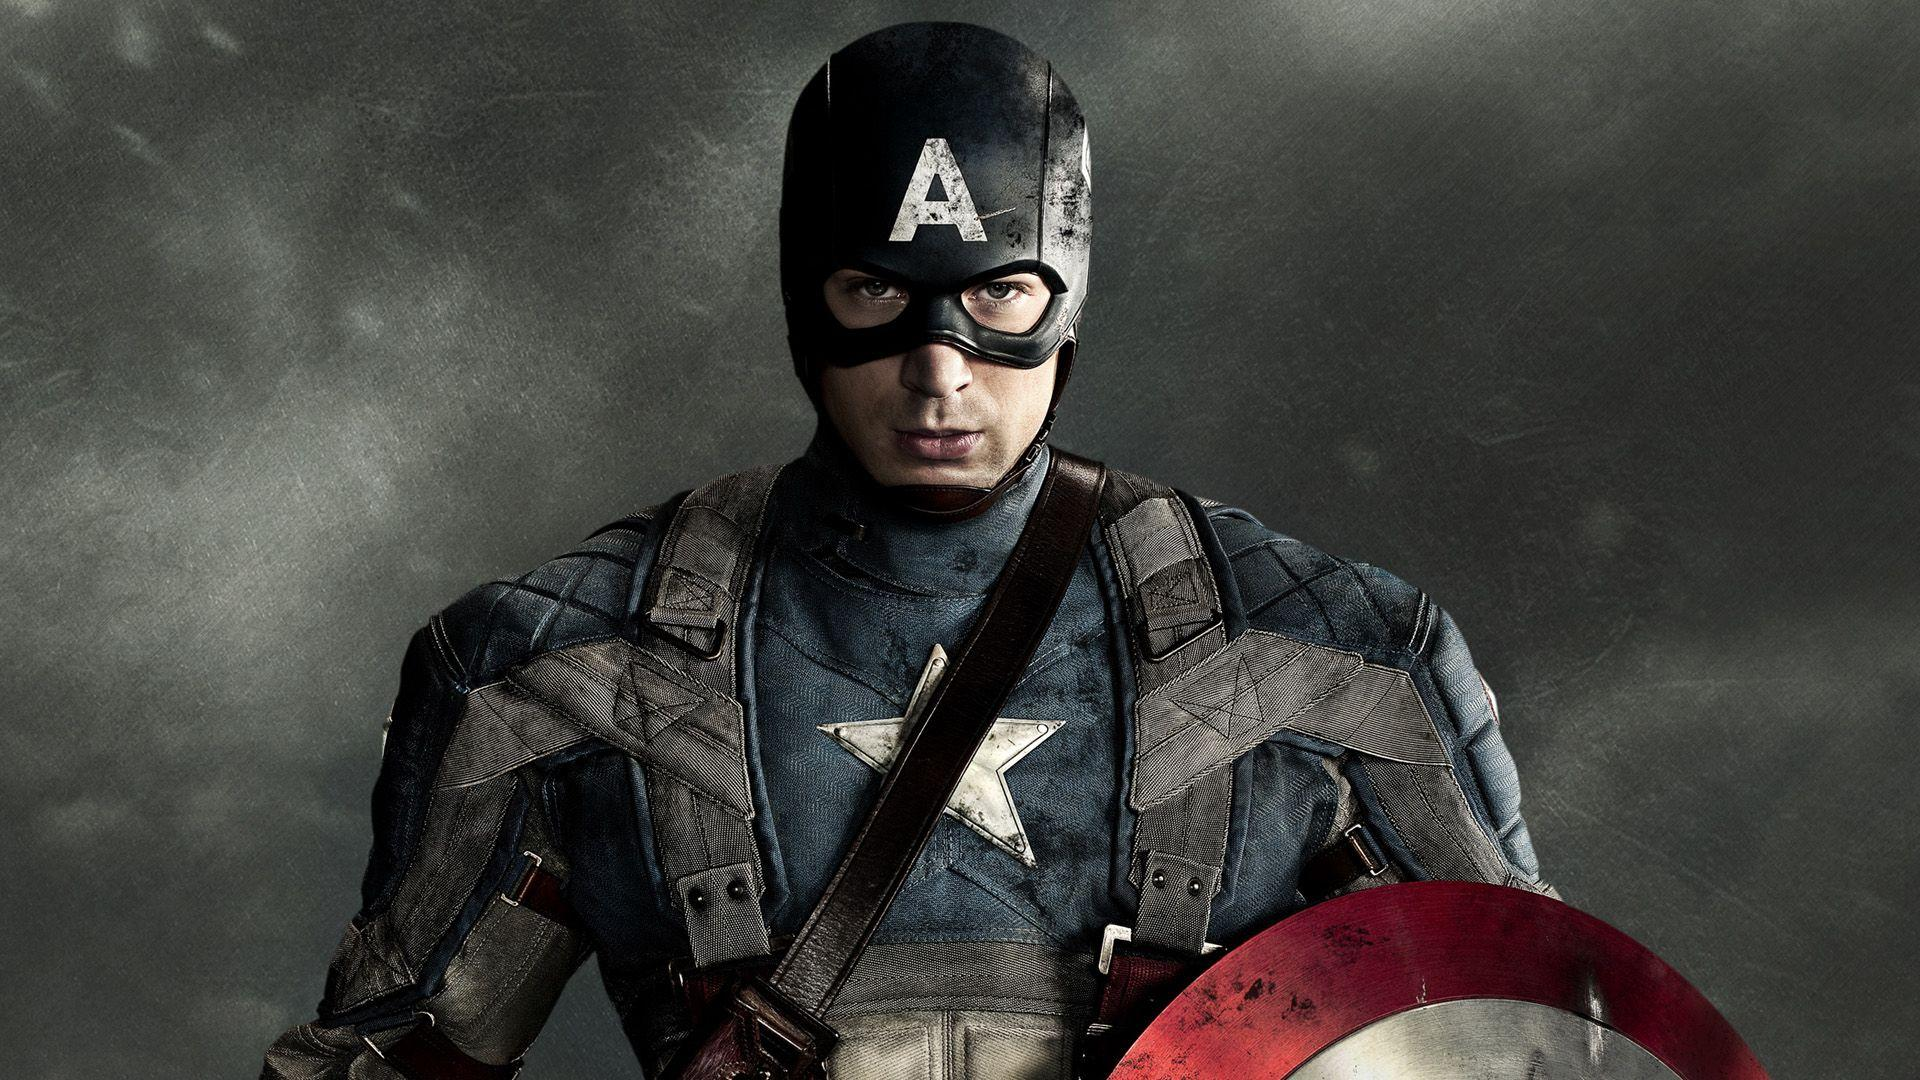 Captain America Winter Soldier Wallpaper Background Shield Desktop